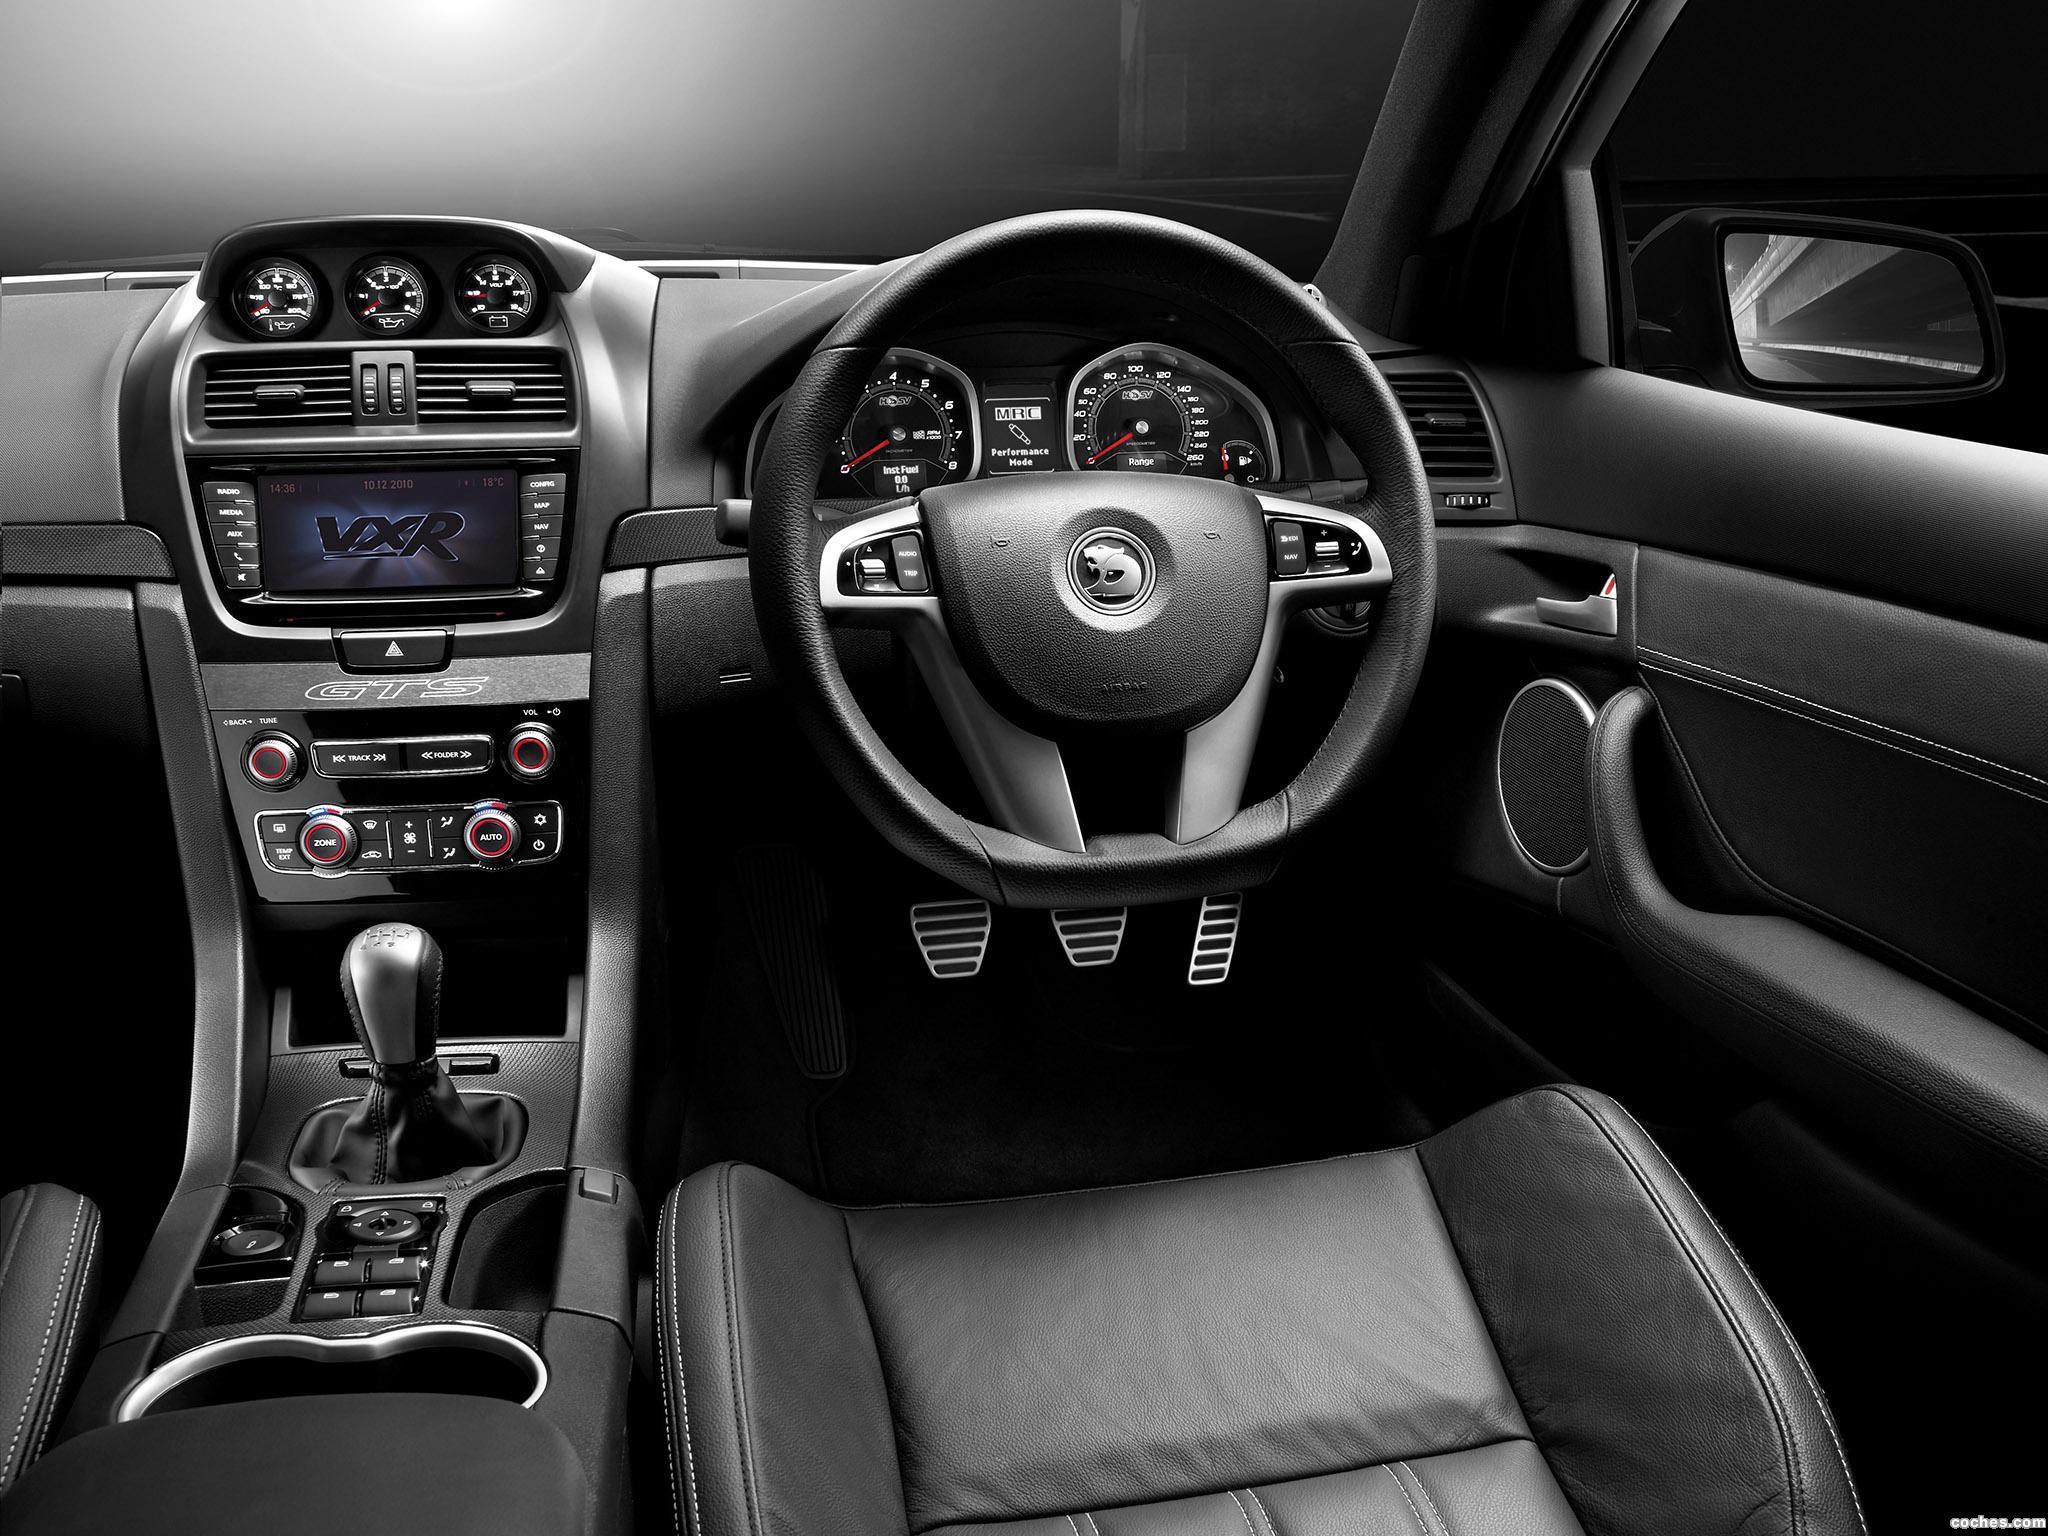 Foto 3 de Vauxhall VXR8 2011